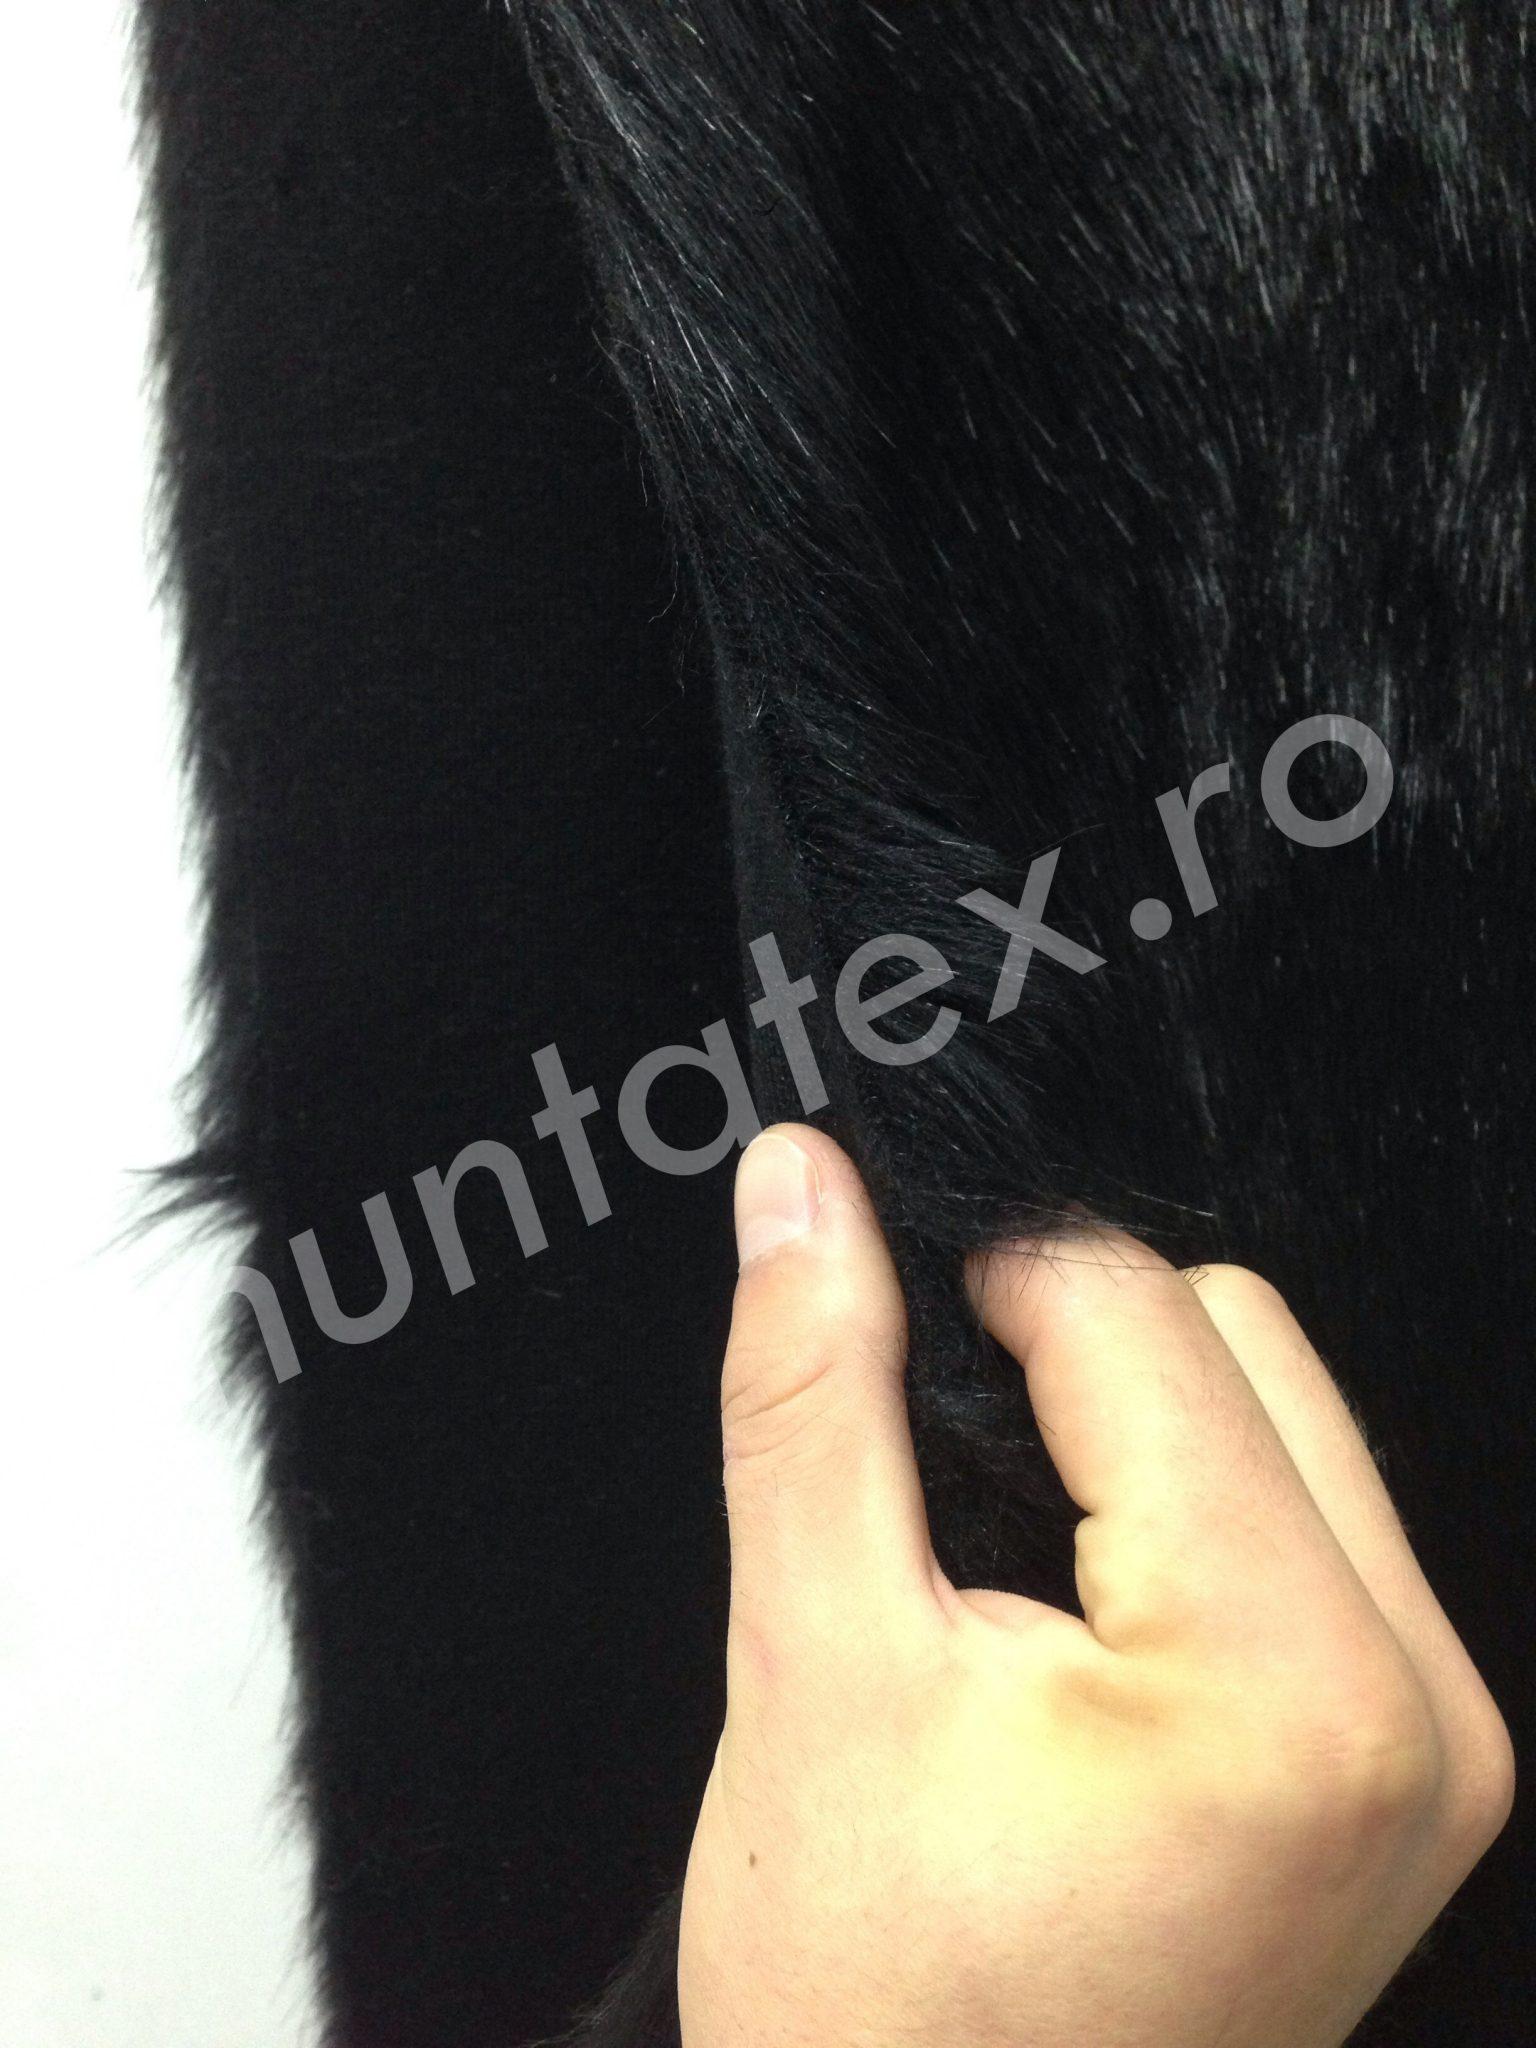 Blana Par Scurt Neagra 51 Artificiala Nuntatex Ro